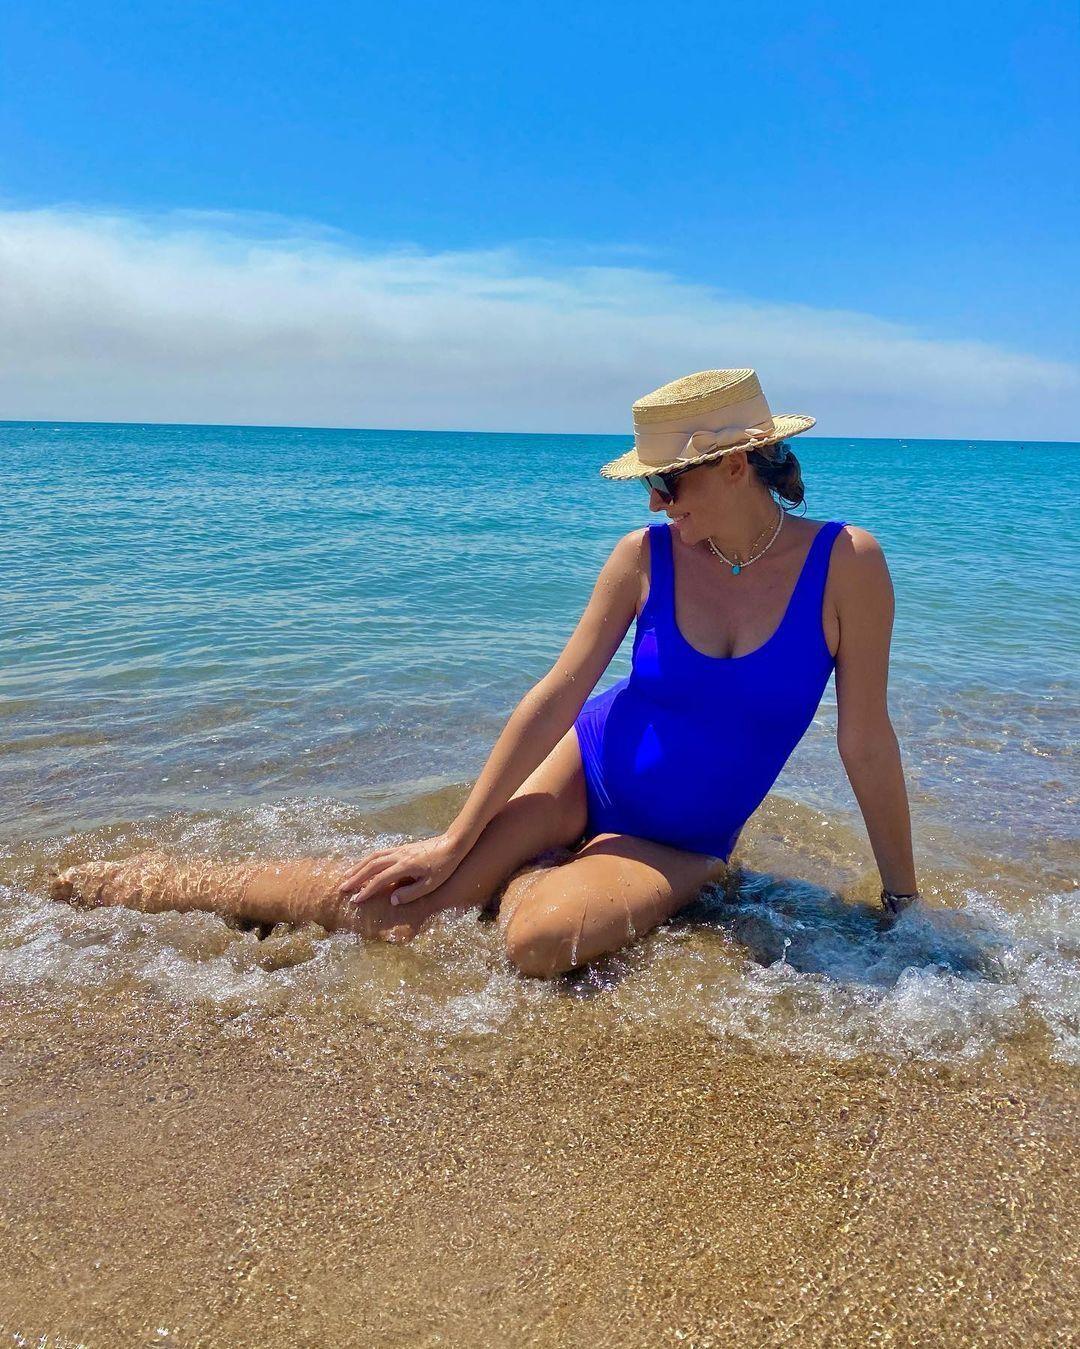 Осадча позувала сидячи на піску з краєвидом на море